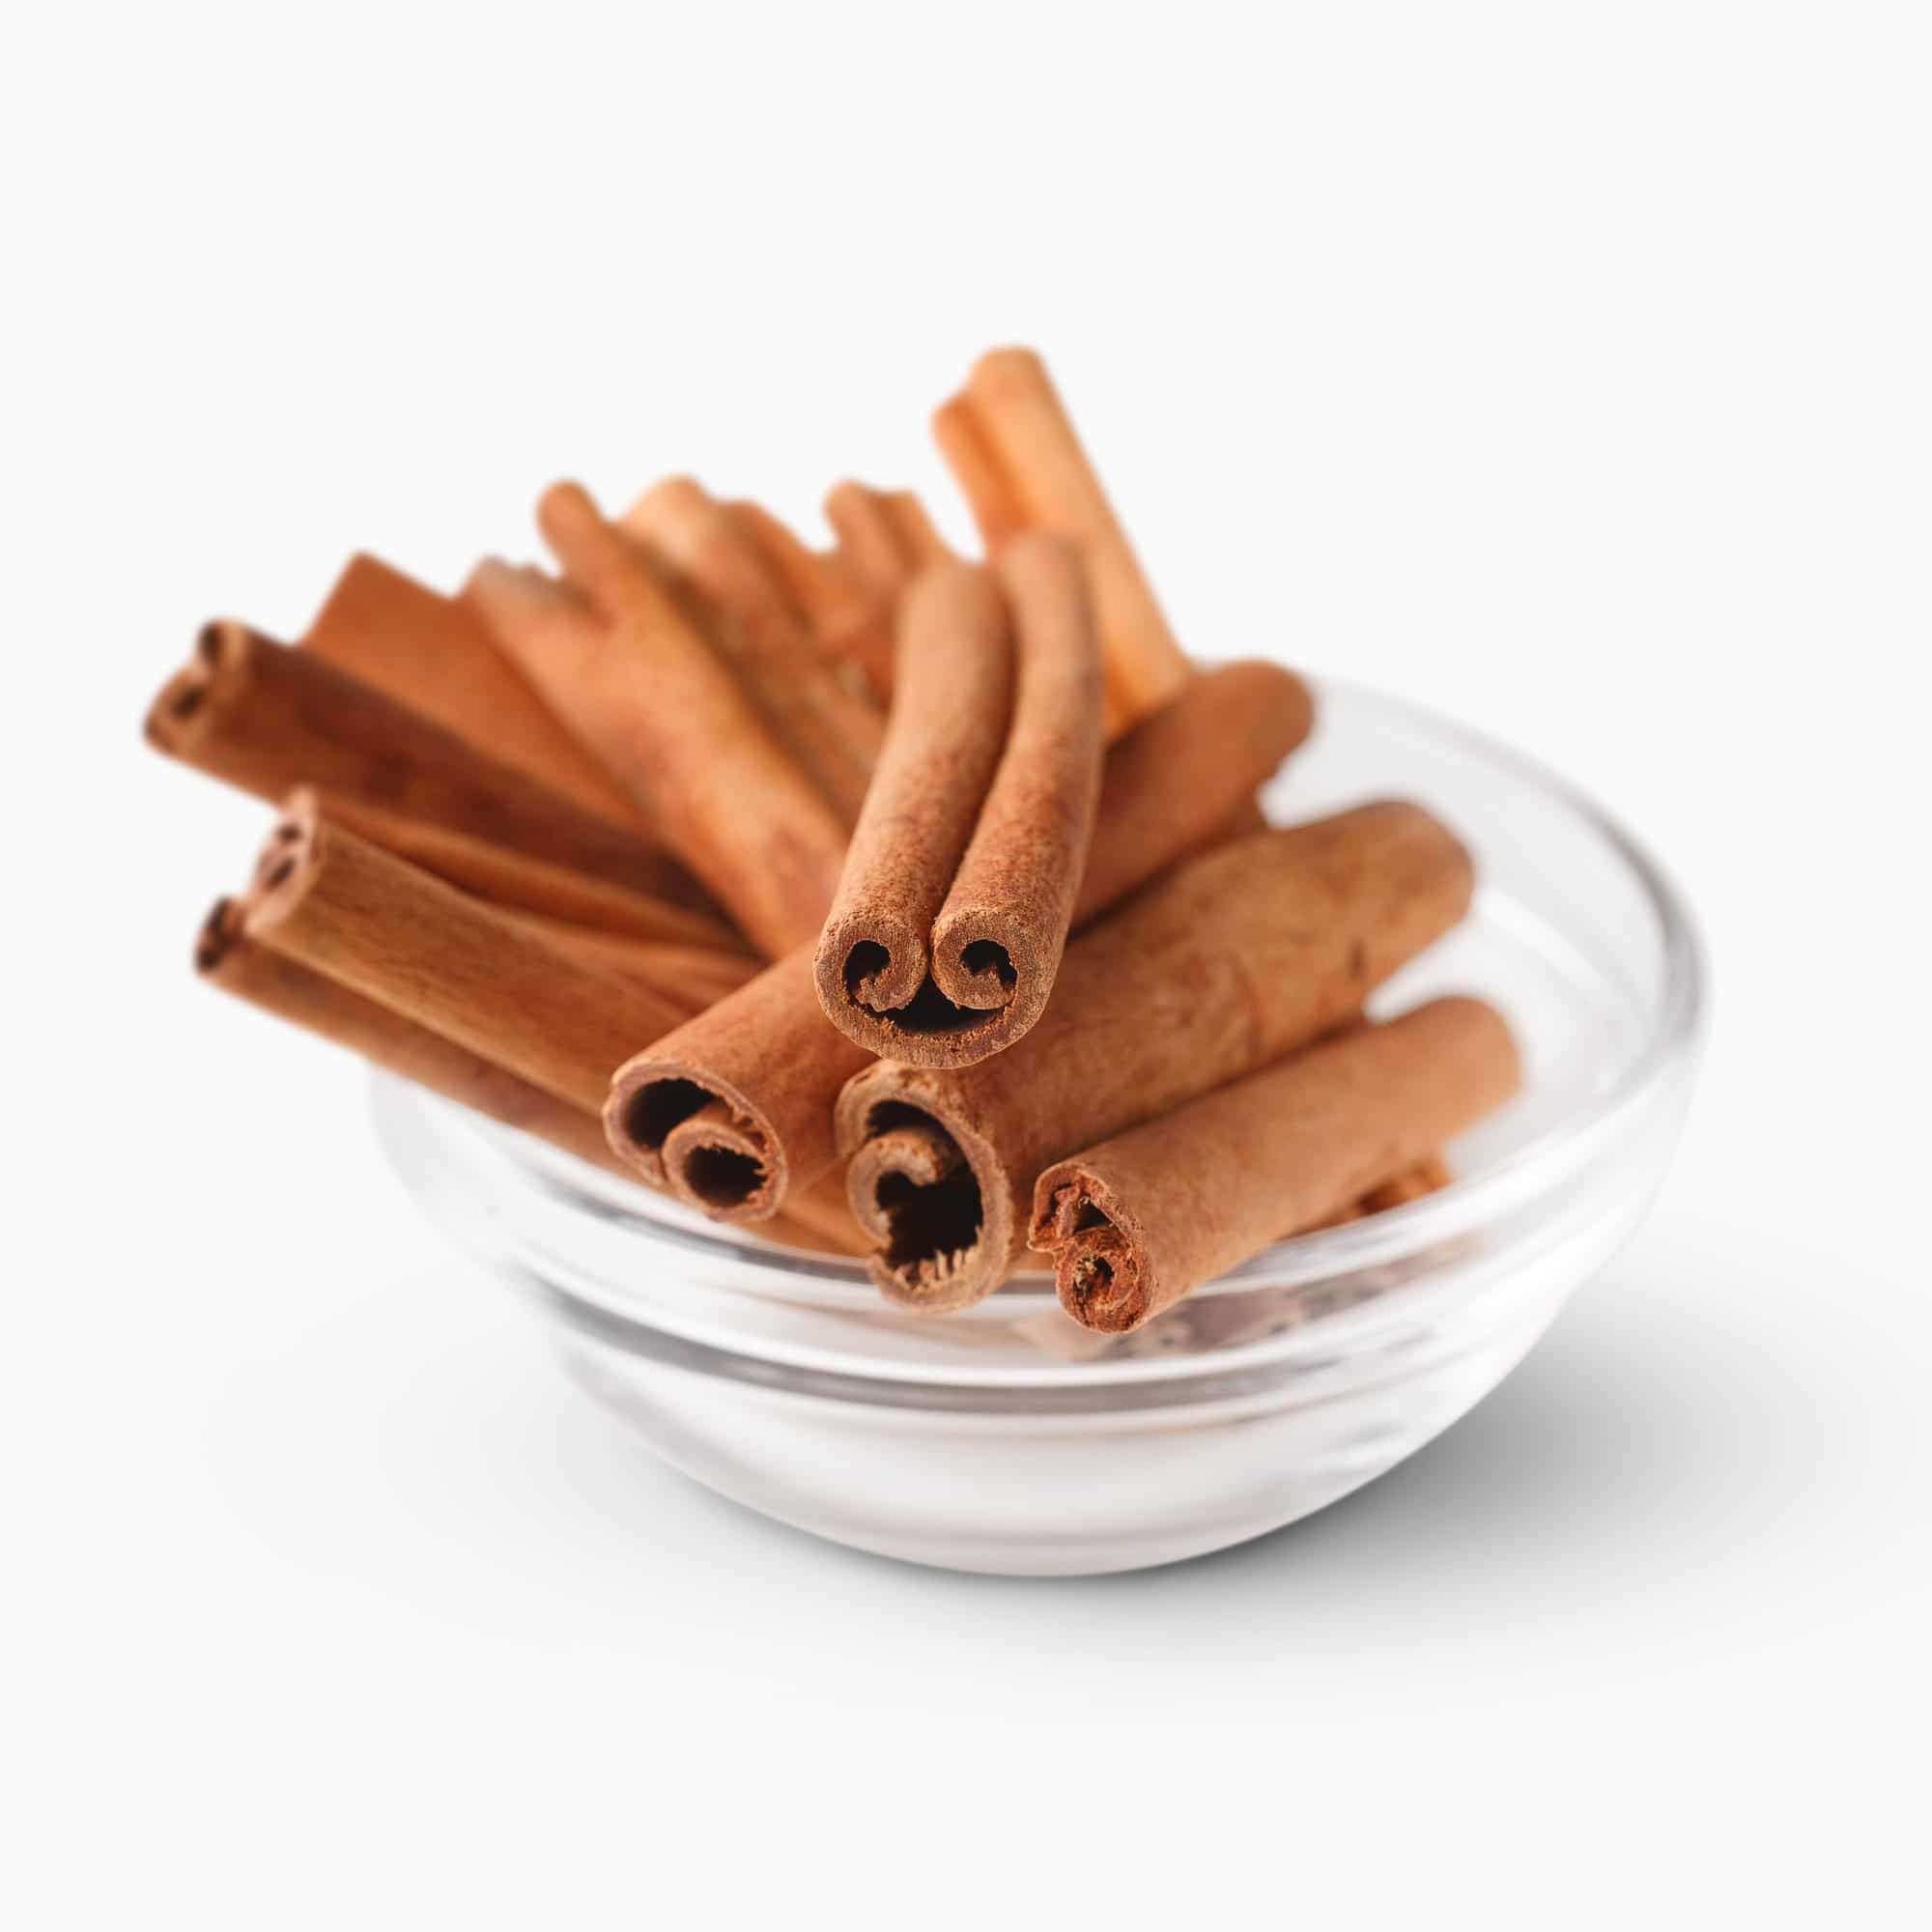 Bowl with cinnamon